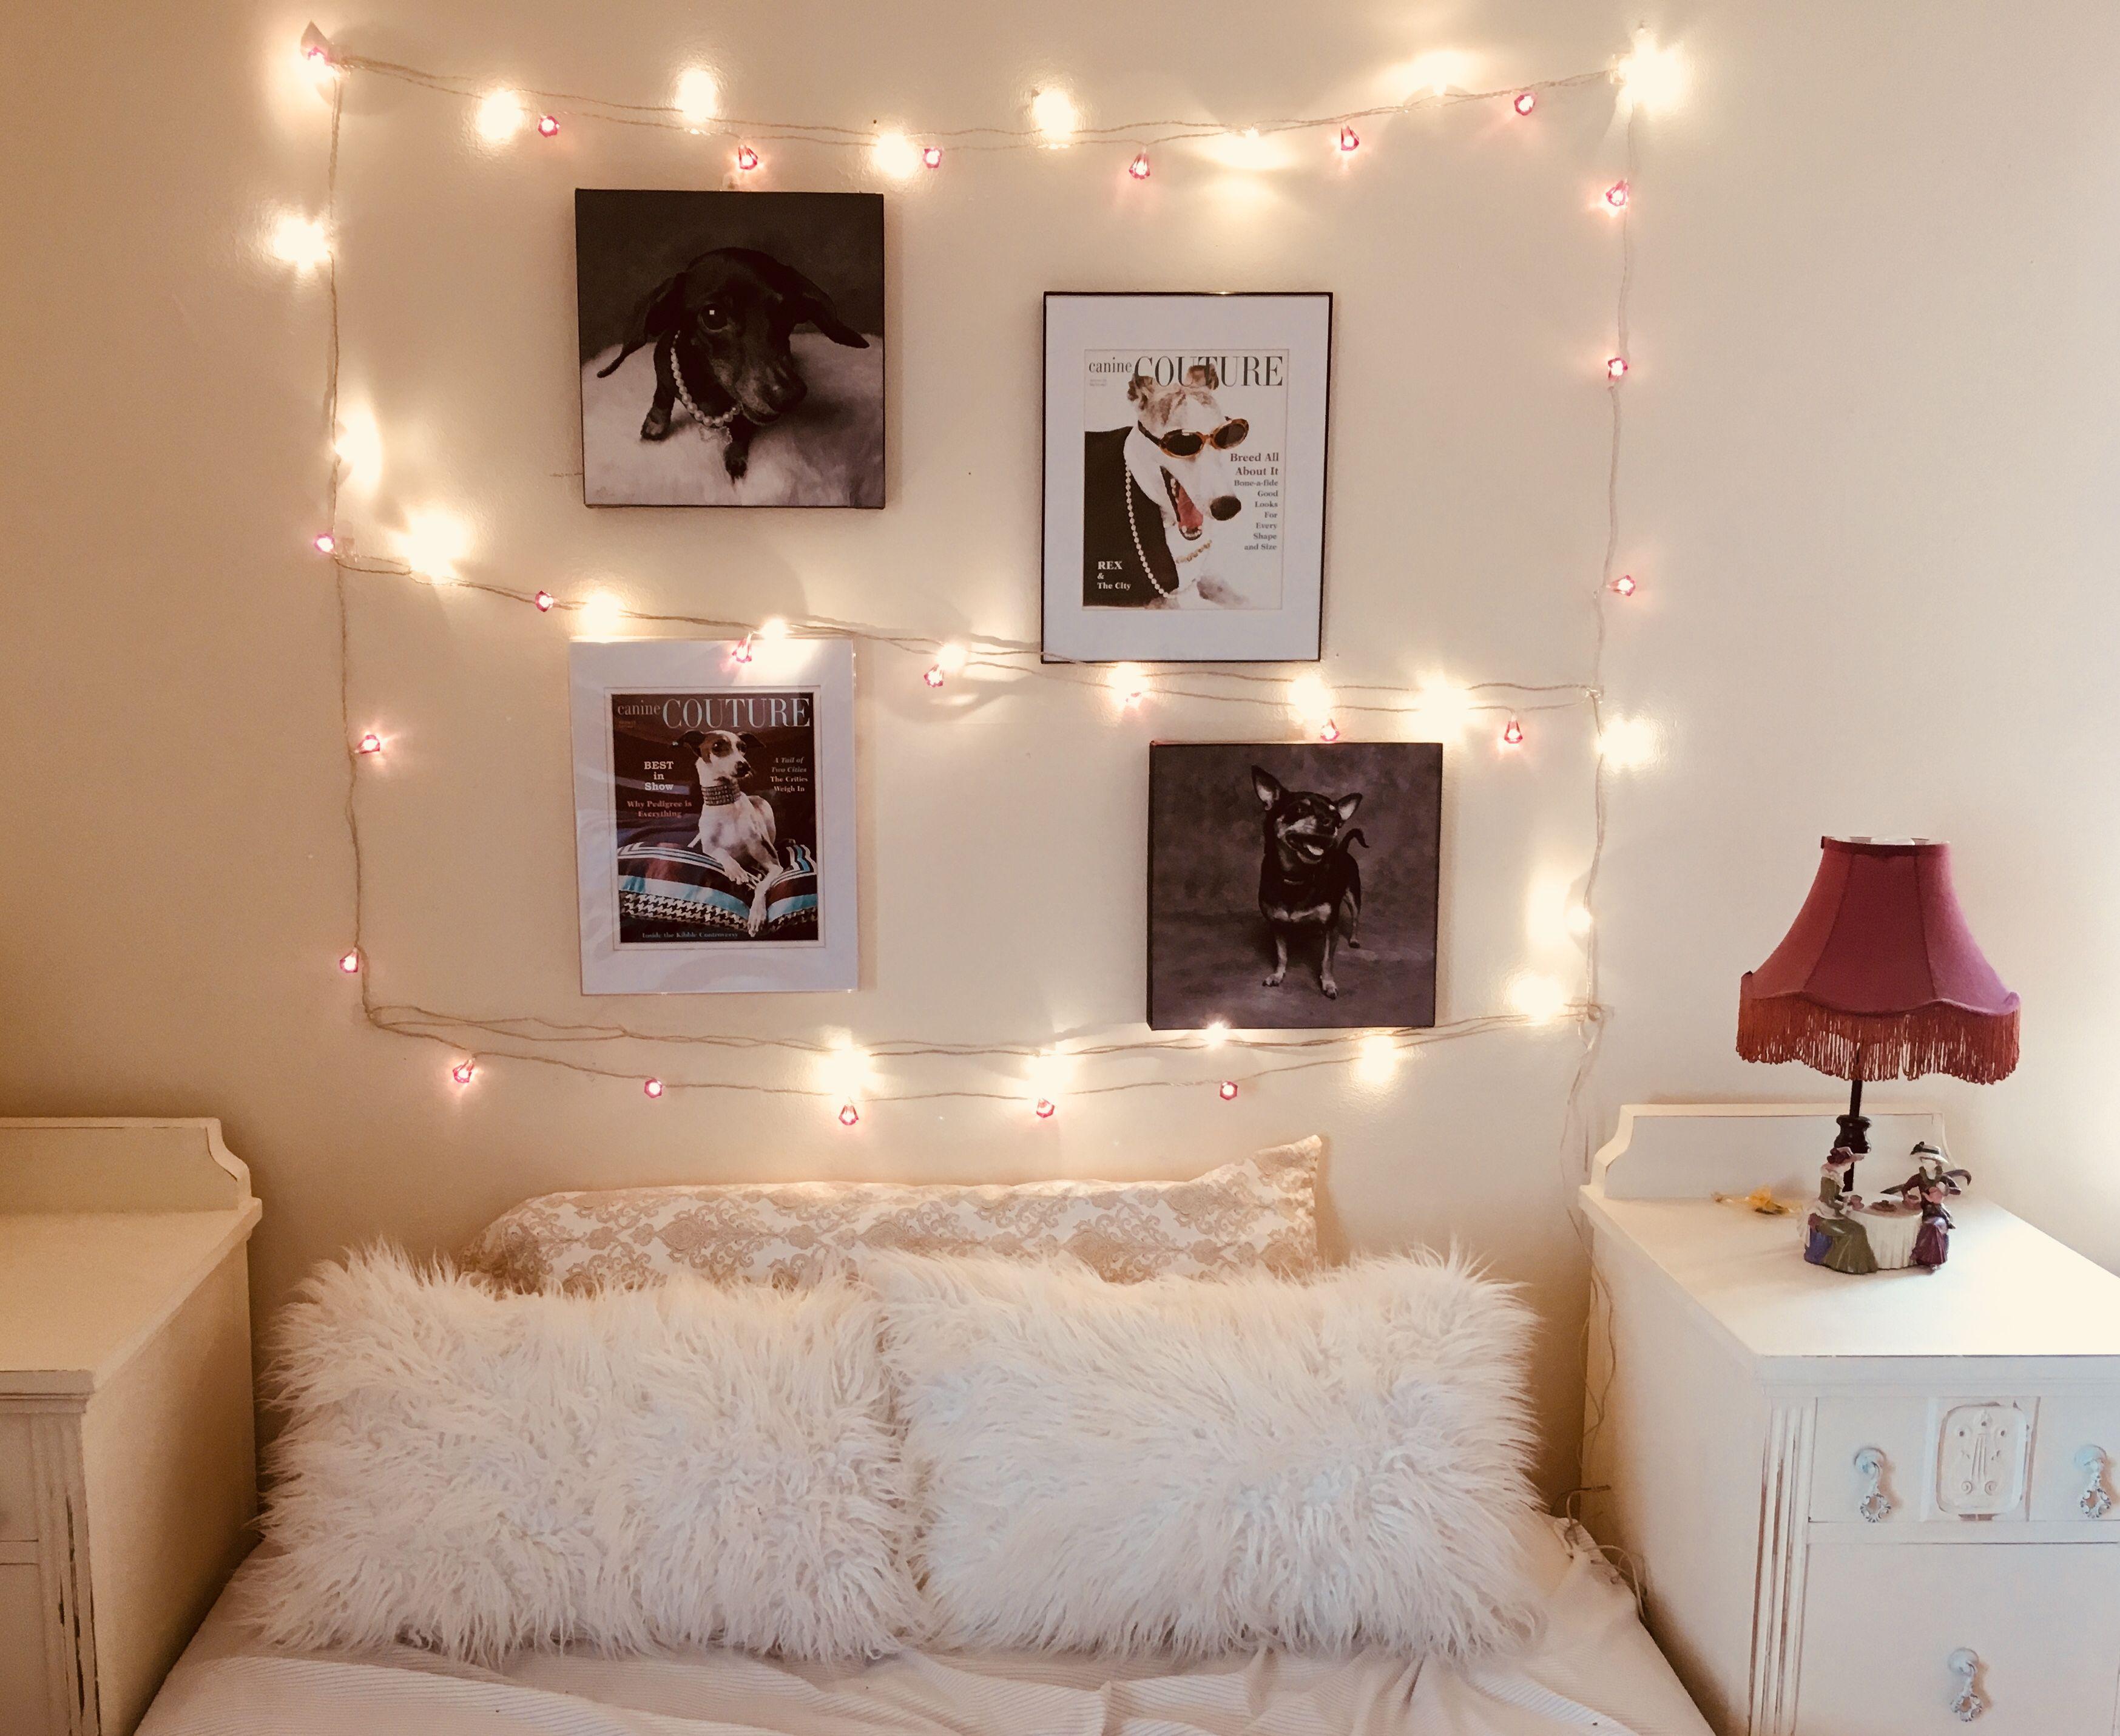 Bedroom lights ideas  Bedroom lights  Great Ideas  Pinterest  Bedroom lighting Bedroom